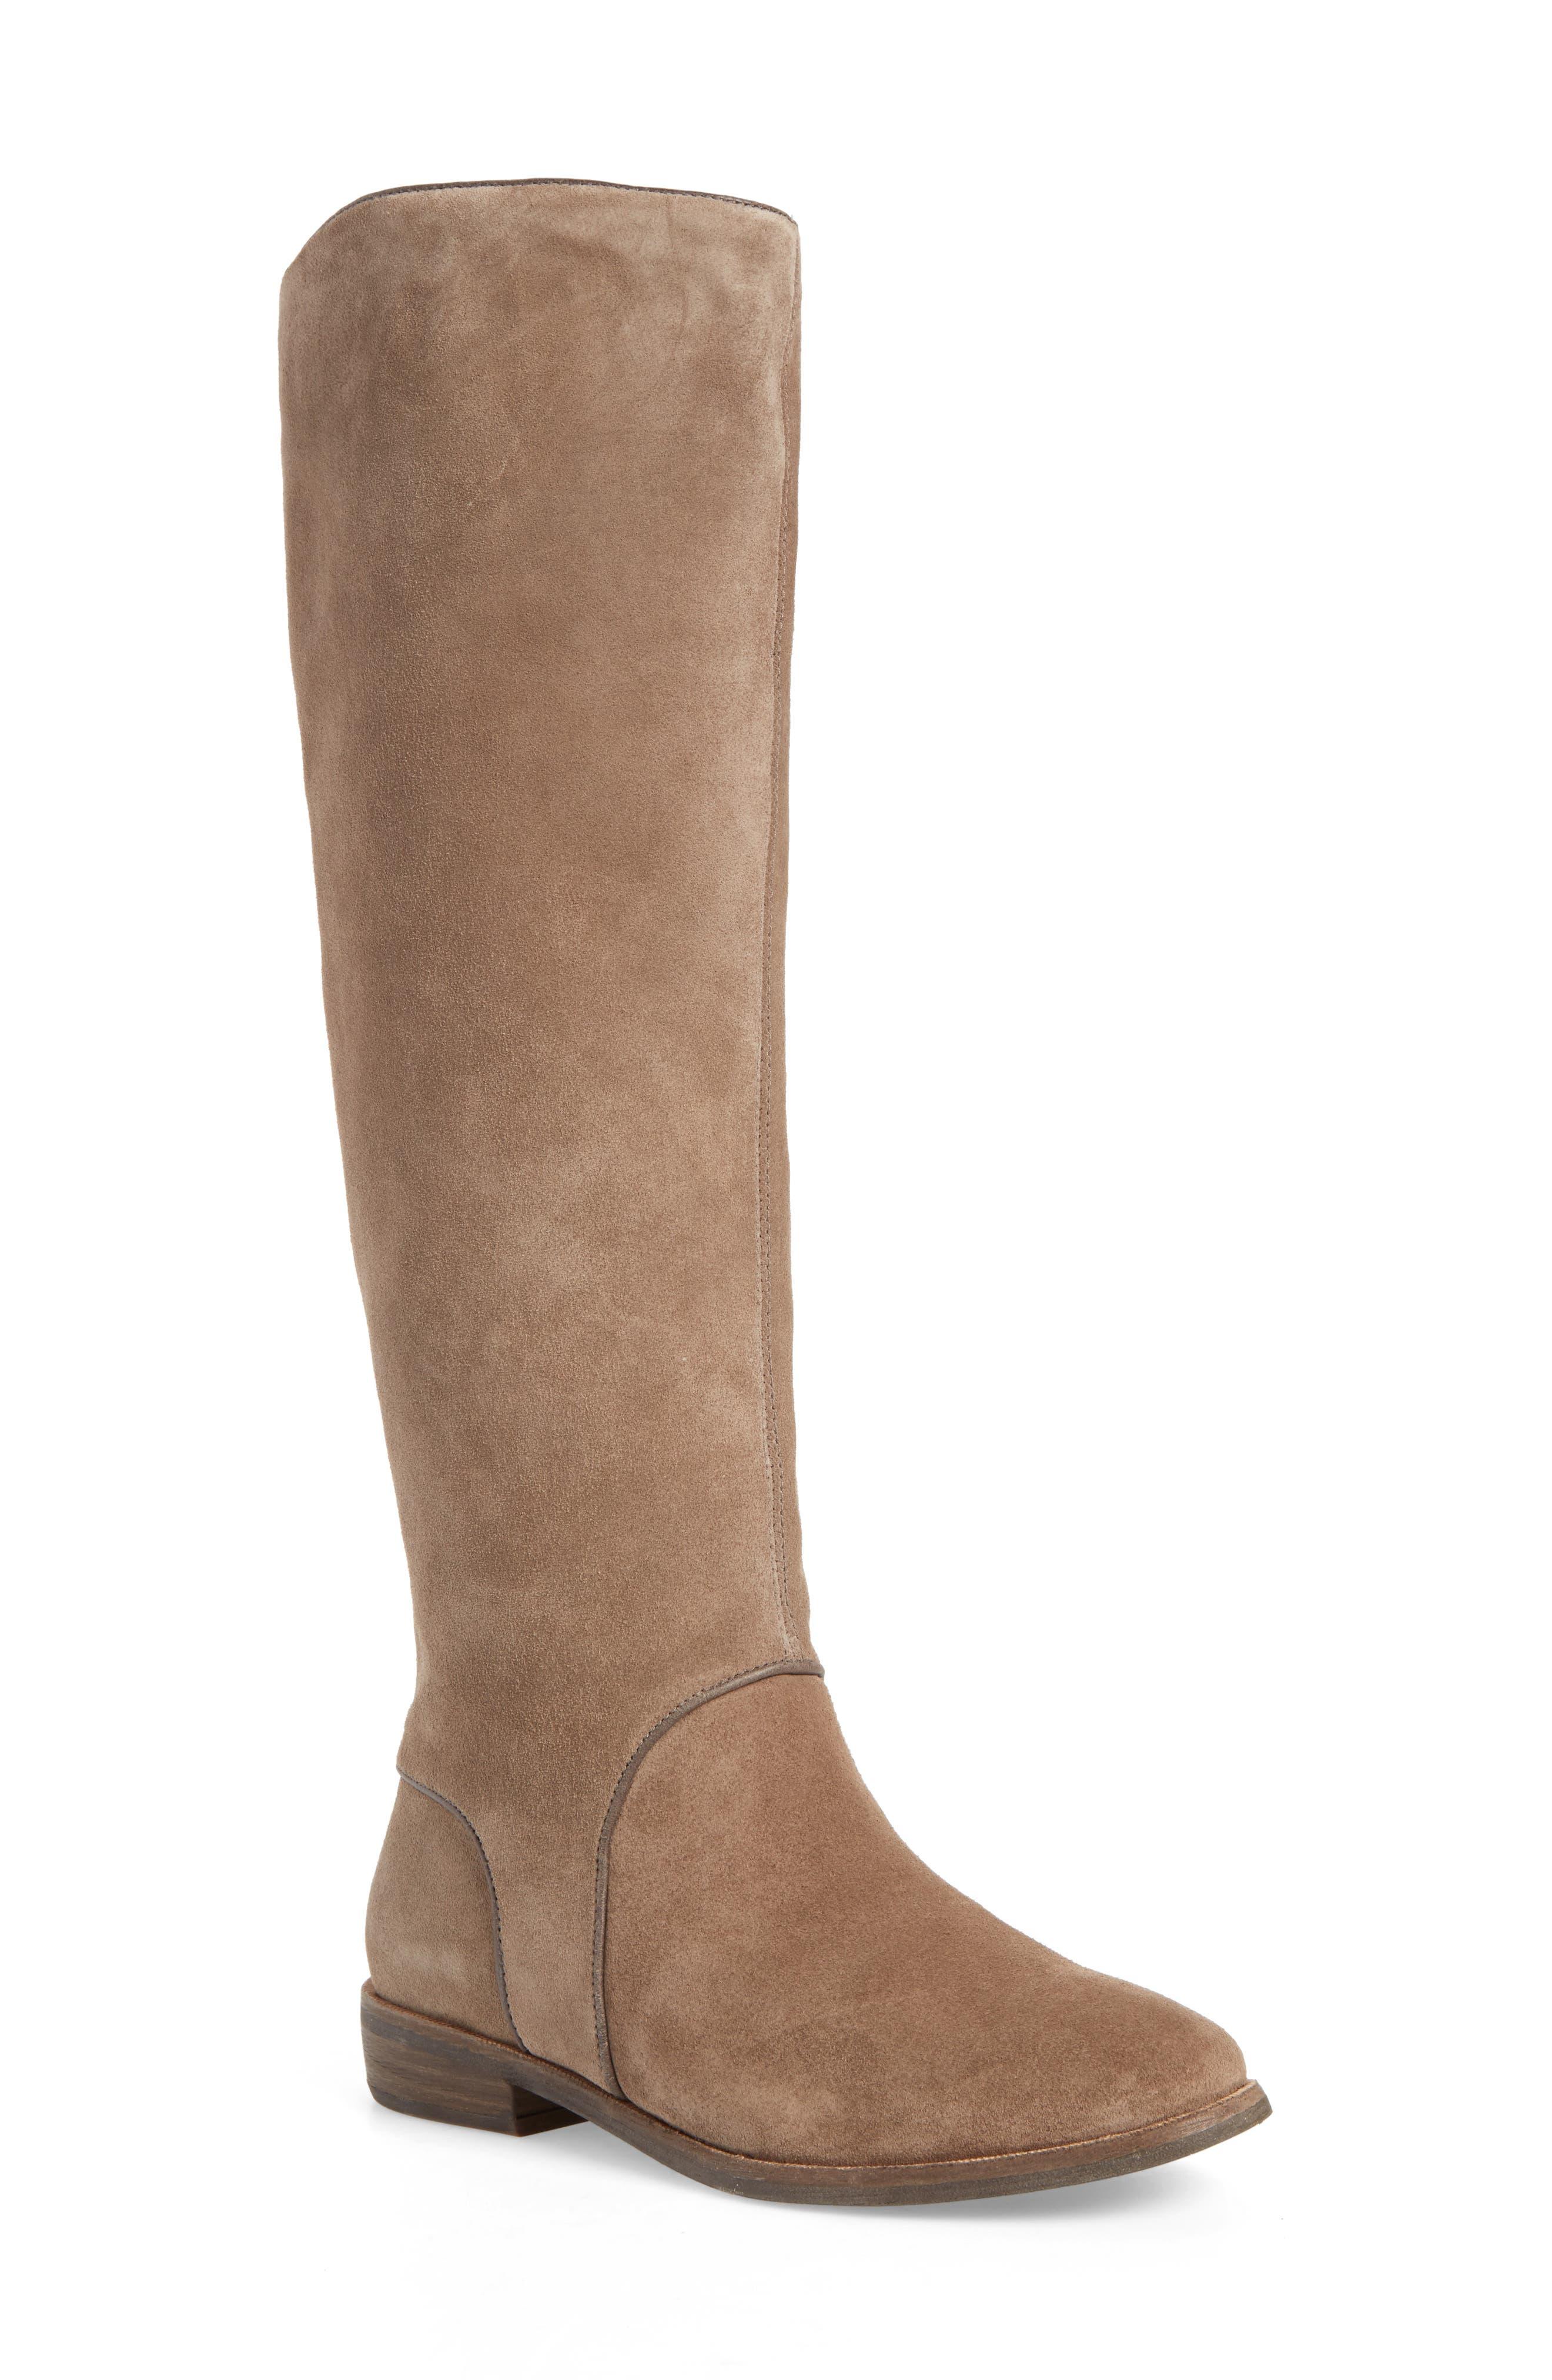 Main Image - UGG® Gracen Knee High Boot (Women)